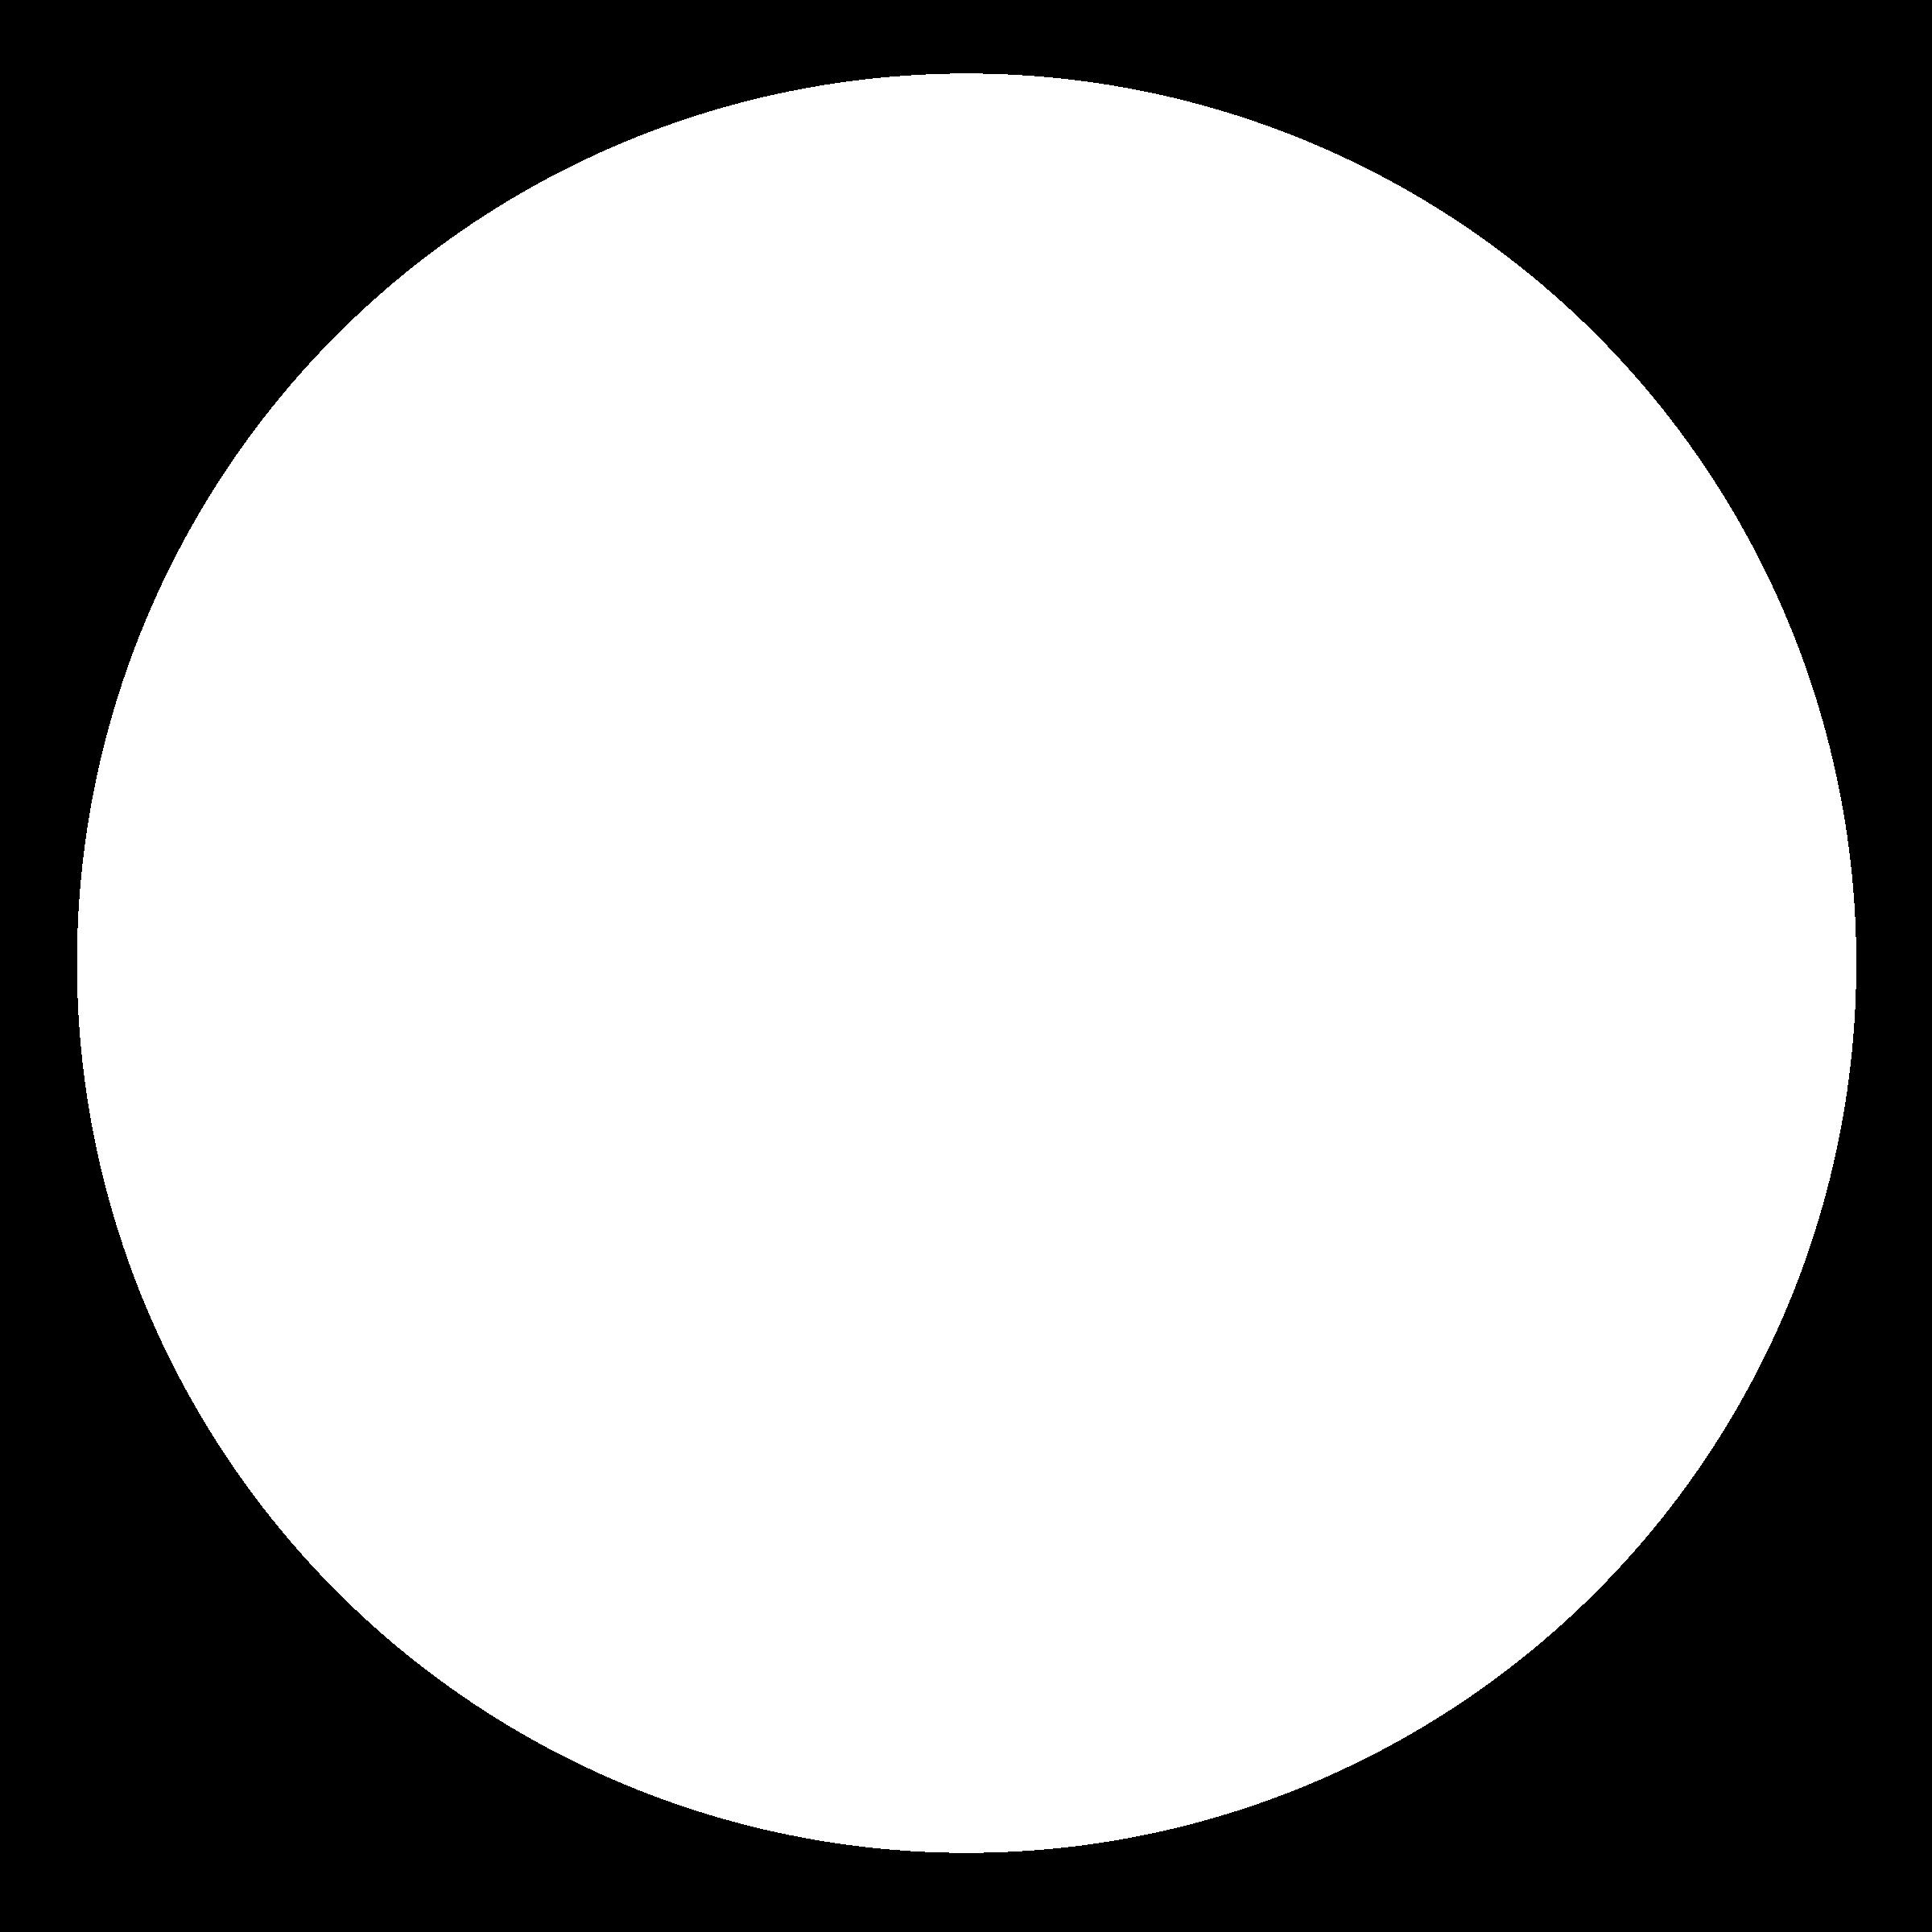 GREEN ELECTRICITY Logo PNG Transparent & SVG Vector